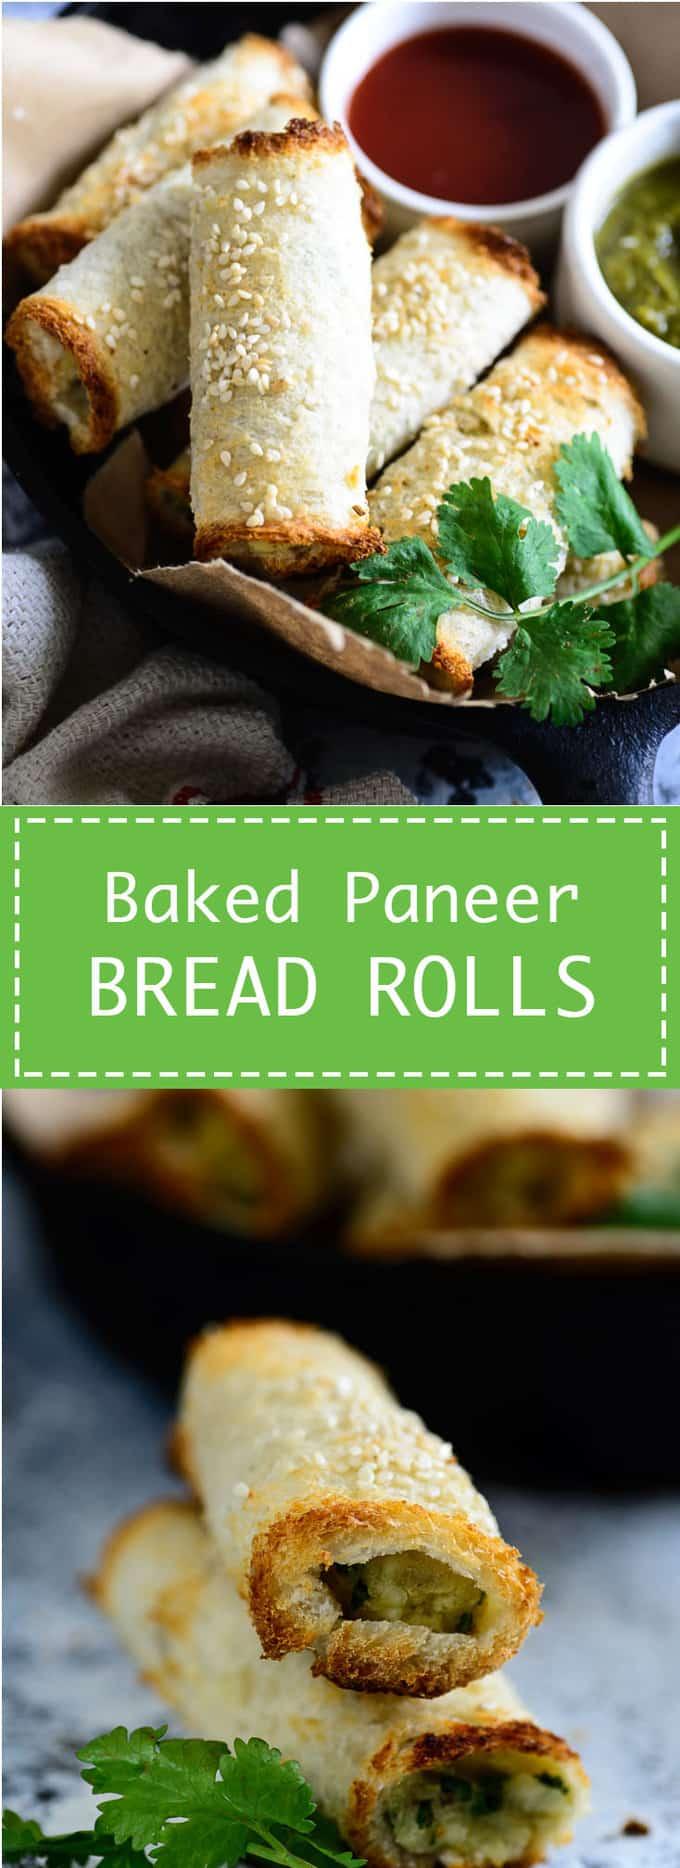 Baked Paneer Bread Rolls